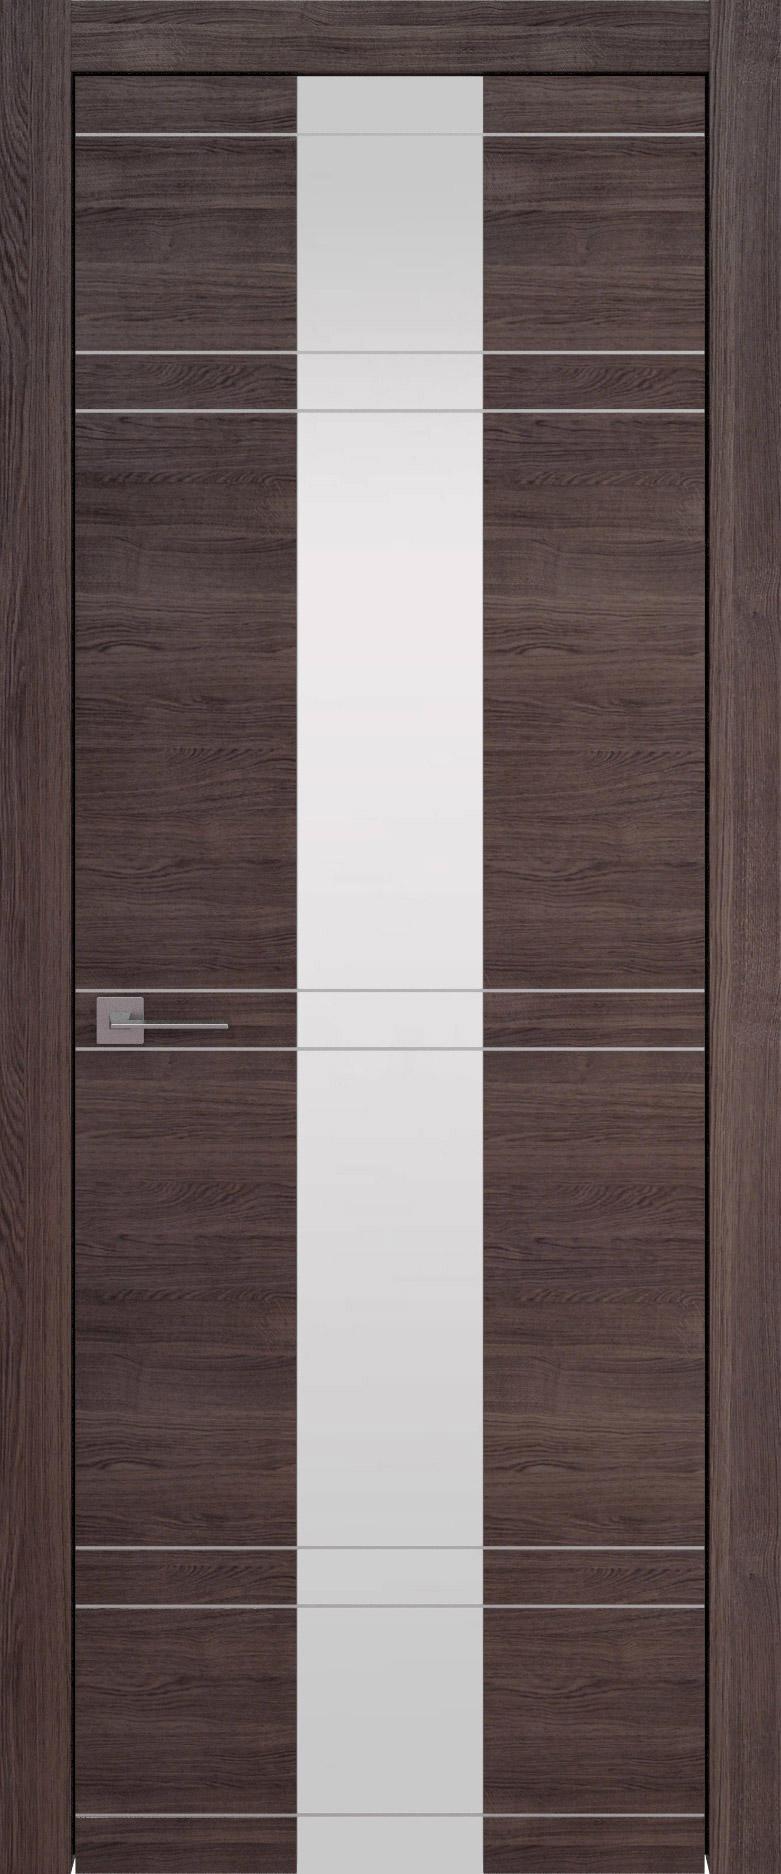 Tivoli Ж-4 цвет - Венге Нуар Со стеклом (ДО)